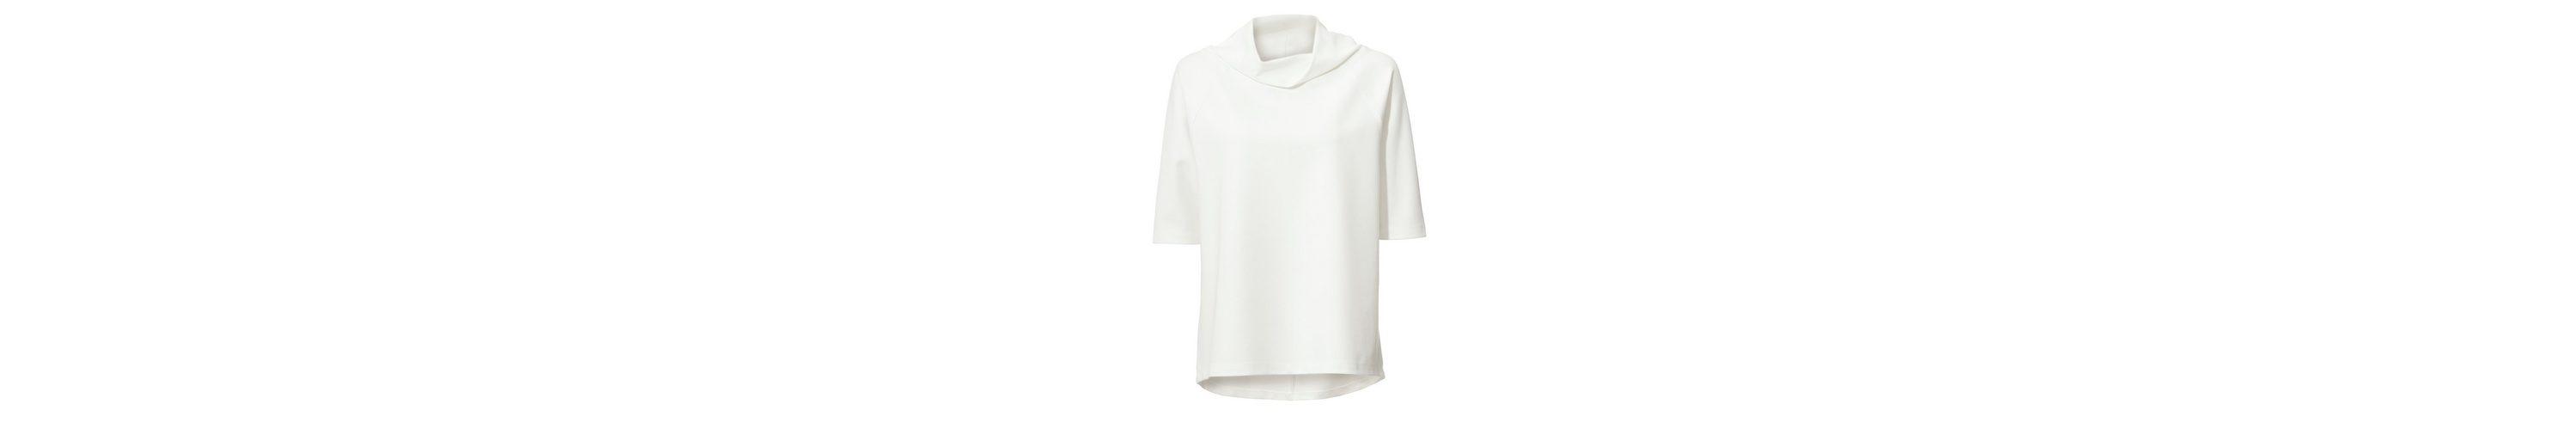 Shirt mit RICK Heine Oversized RICK Oversized Heine Rollkragen CARDONA by CARDONA lockerem by qwz4v